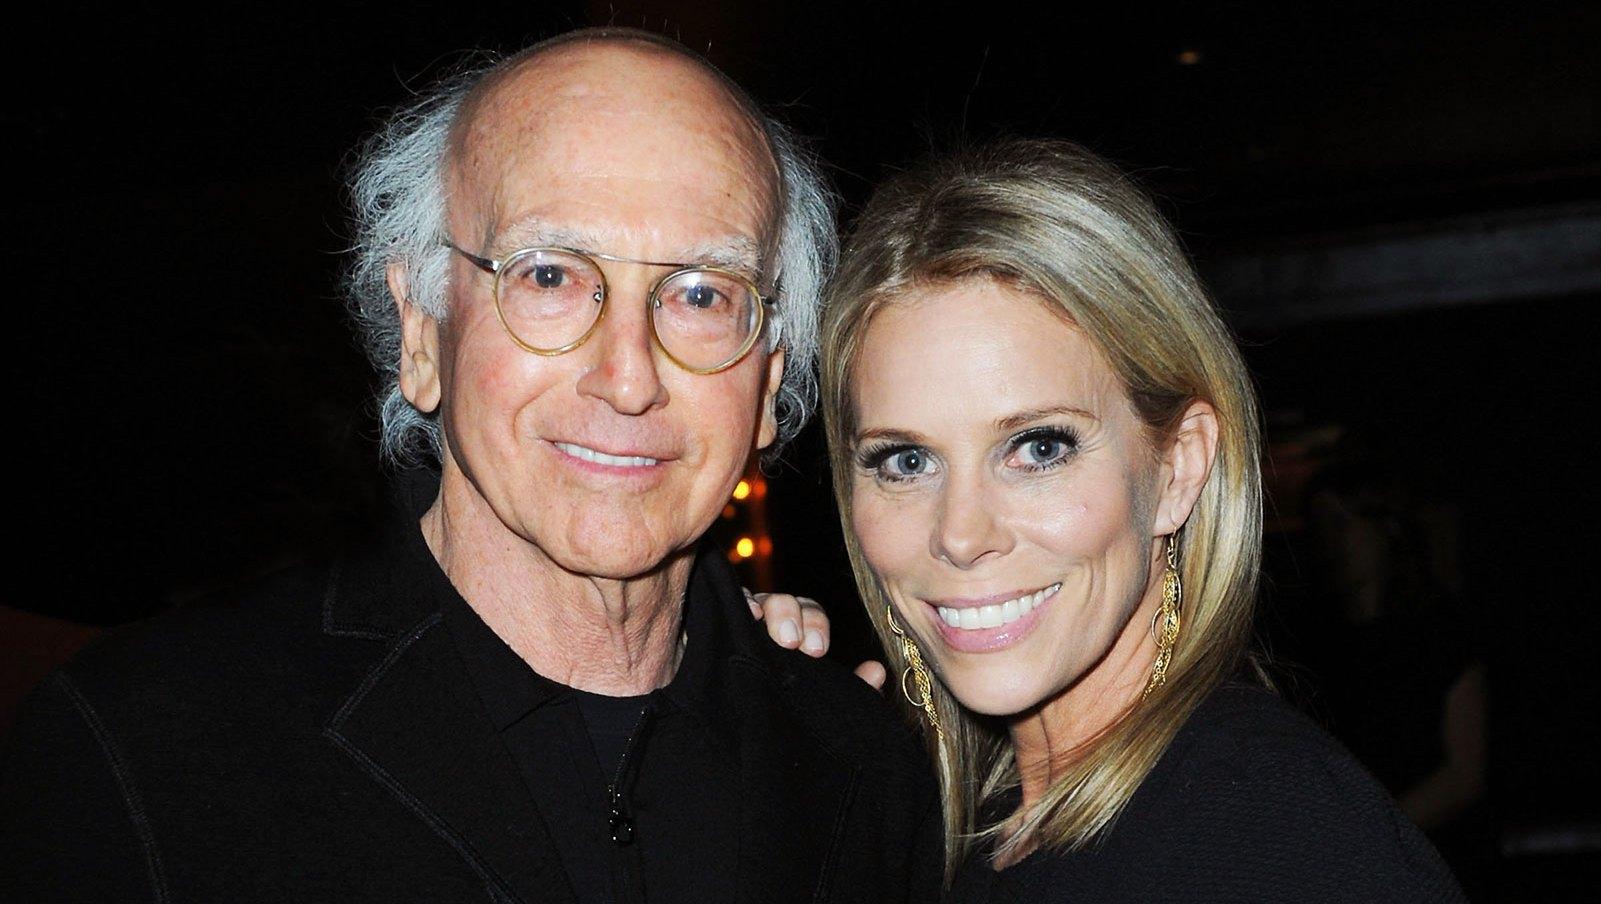 Cheryl Hines Ill Boss Larry David Around On Curb Your Enthusiasm